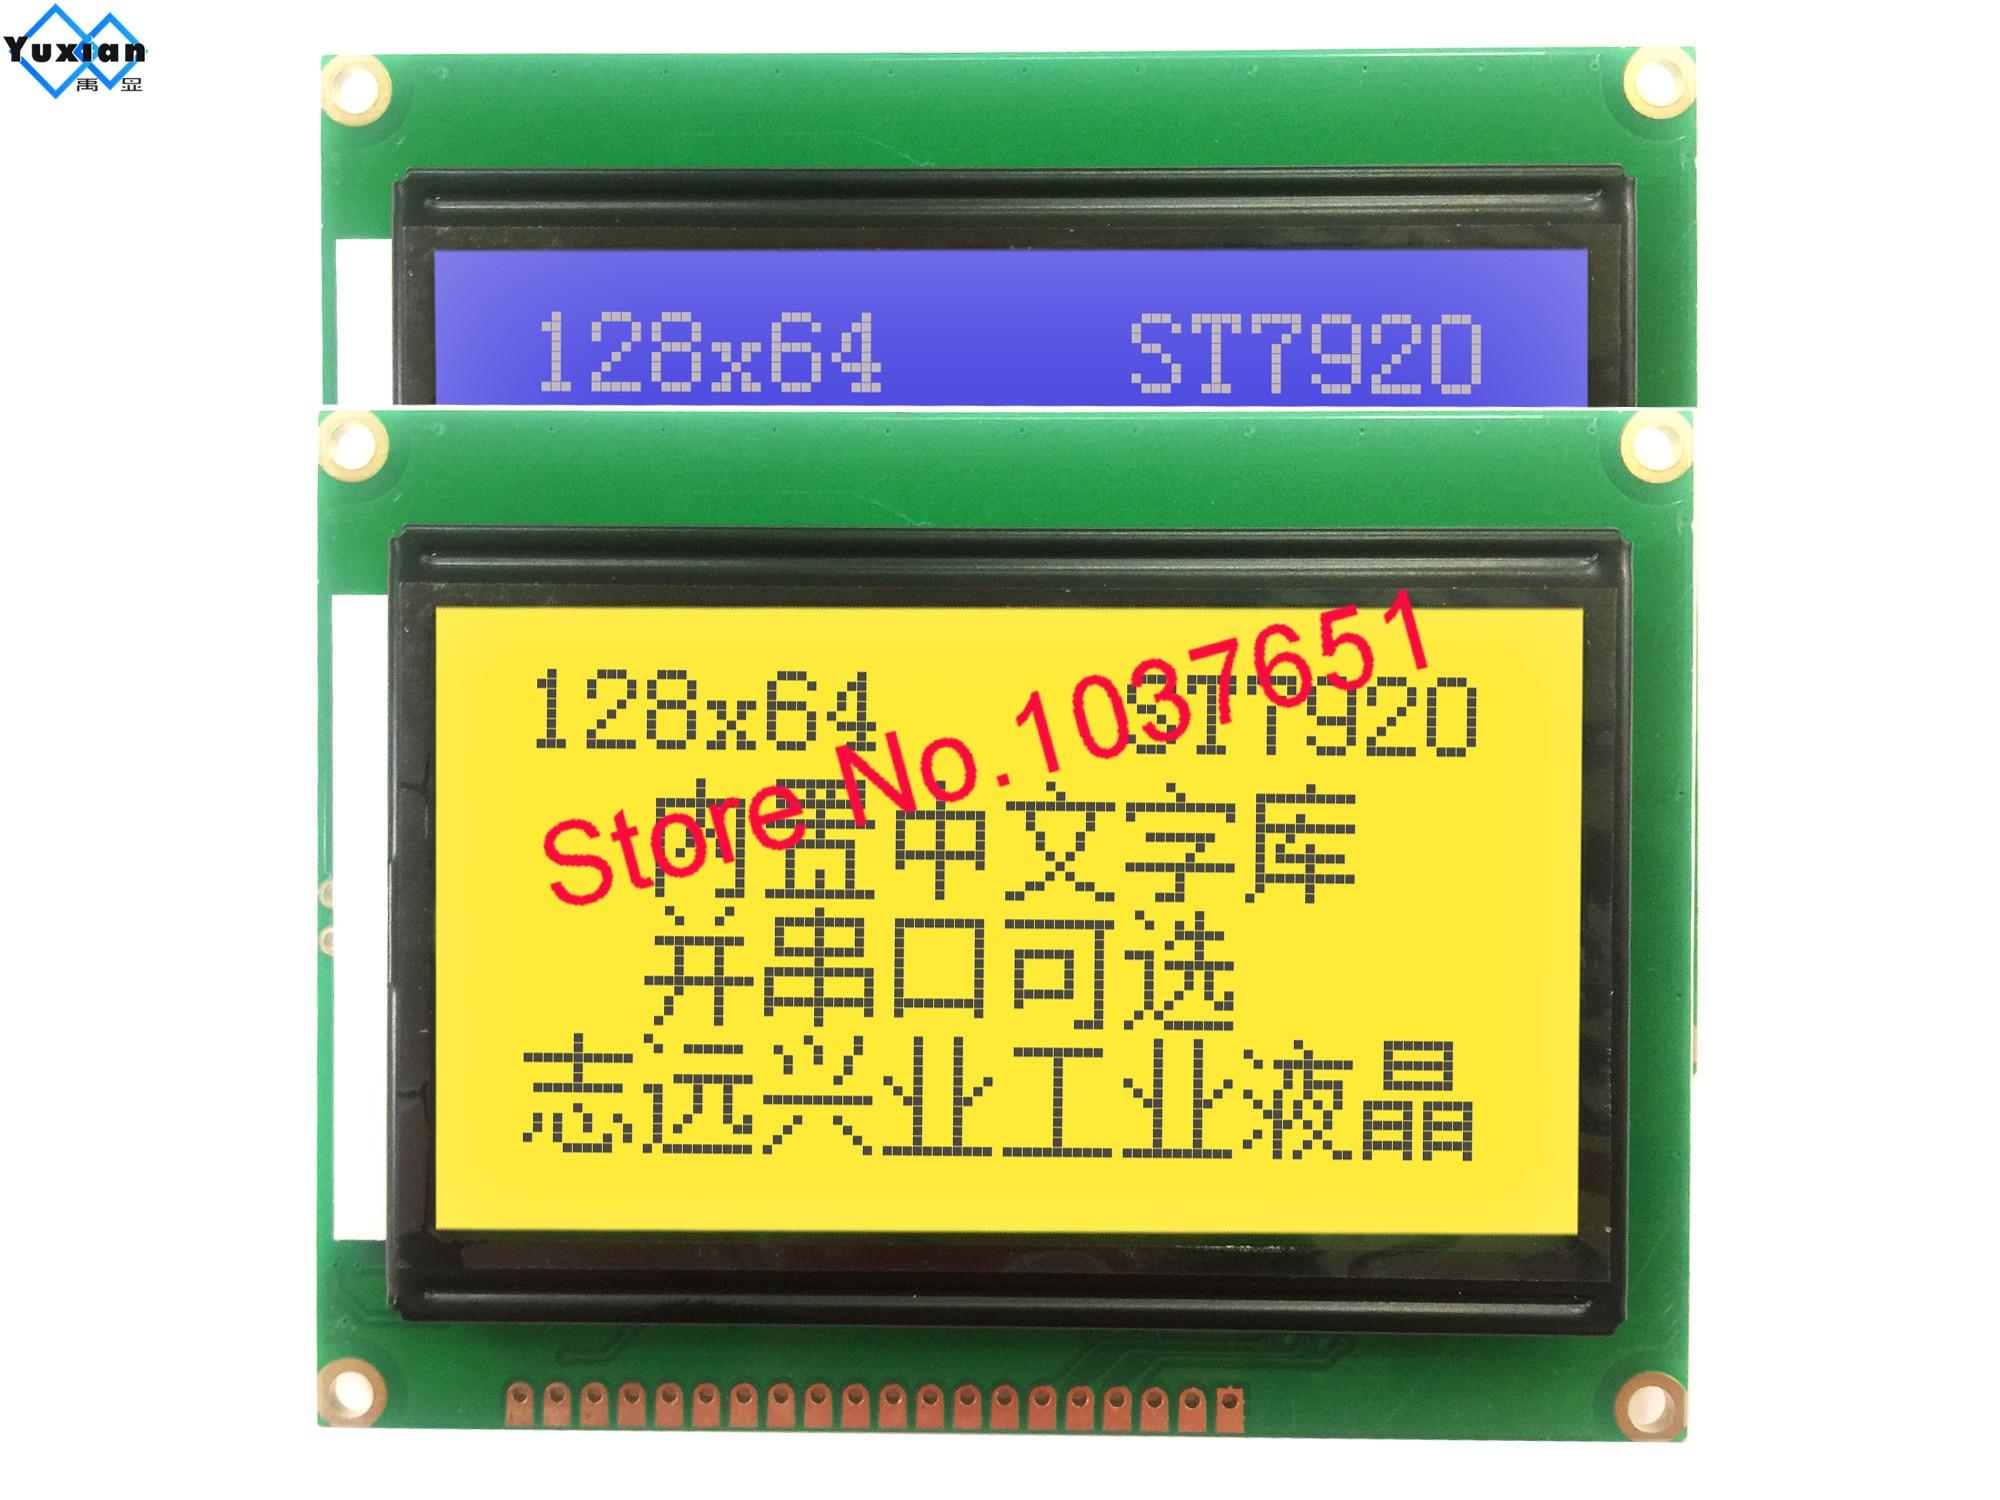 Модуль ЖК-дисплея 12864b V2.0 12864 STN зеленый синий 20pin SPI ST7920